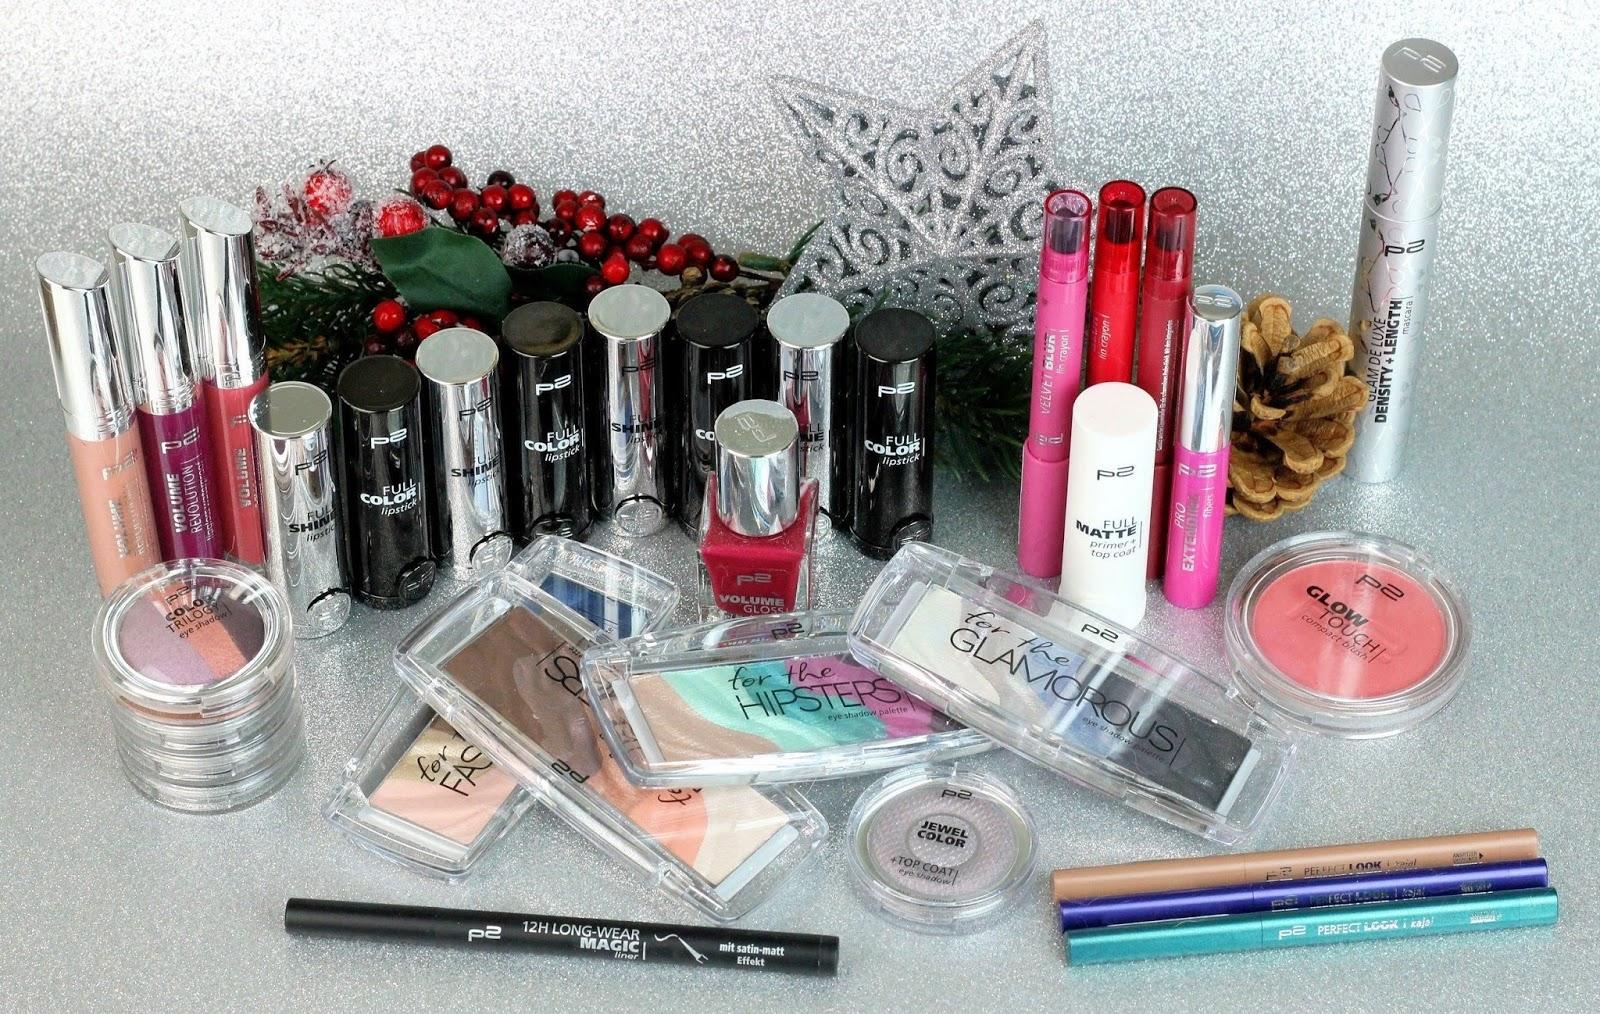 beauty, beauty box, drogerie, farbtrends, gewinnspiel, giveaway, kosmetikpaket, kostenlos, lidschatten, lippenstift, nagellack, neue theke, neues sortiment, neuheiten, p2 cosmetics, produkte testen, verlosung,